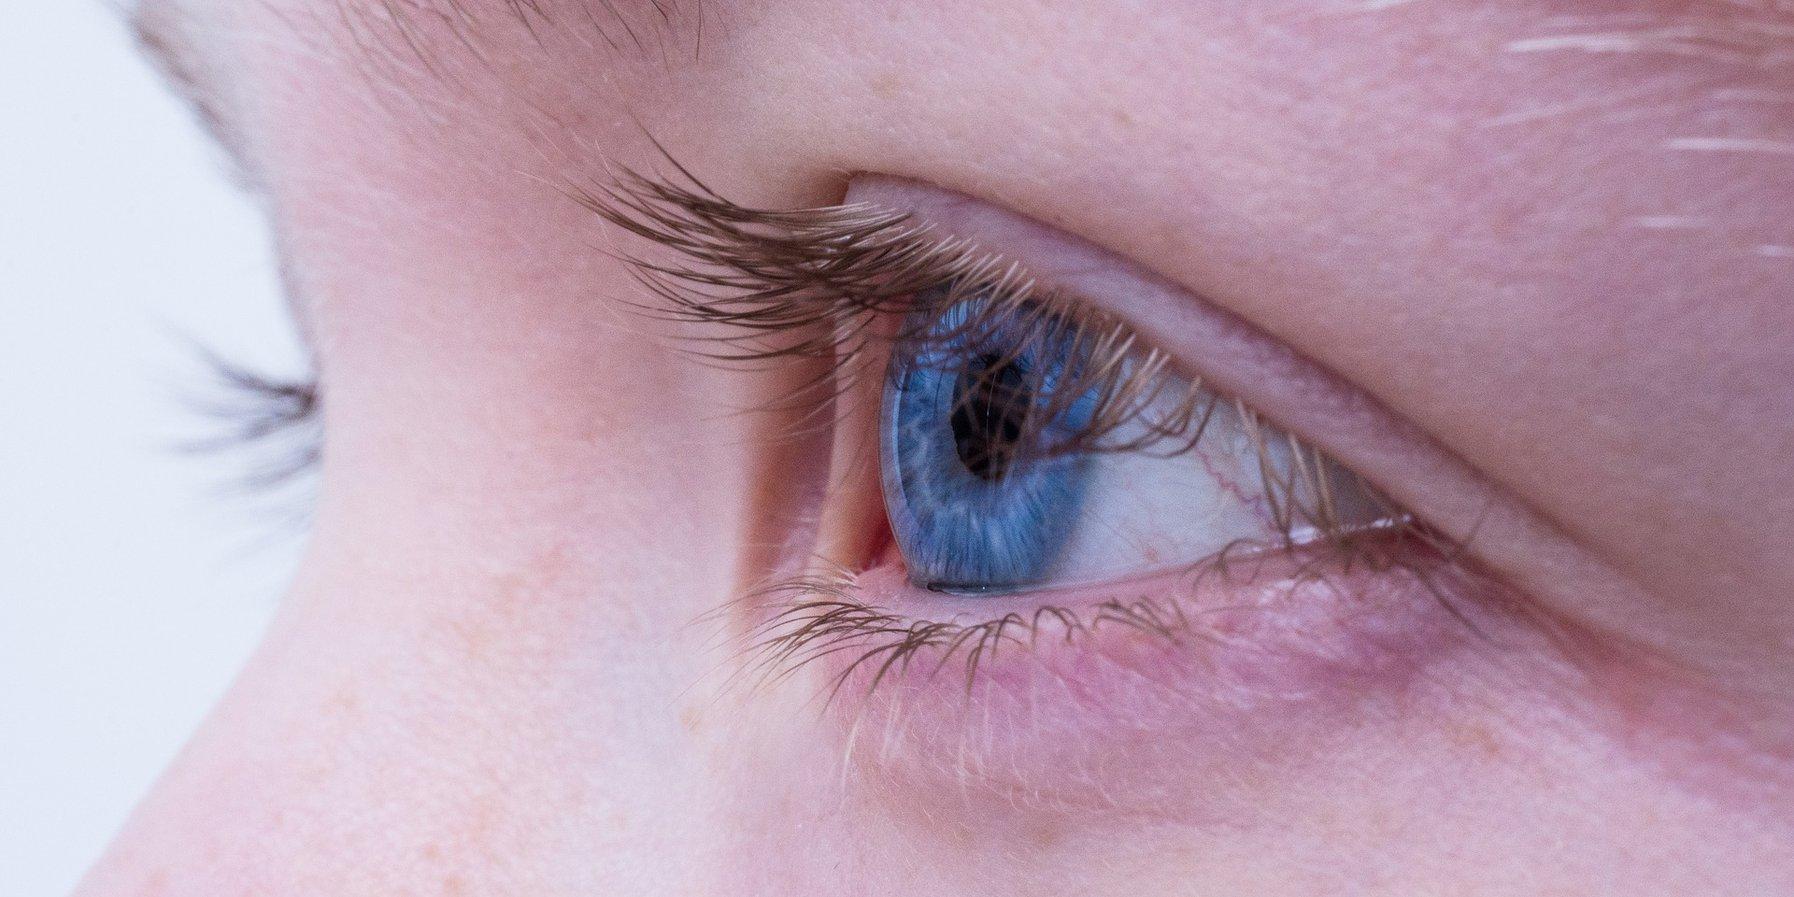 Pupil response